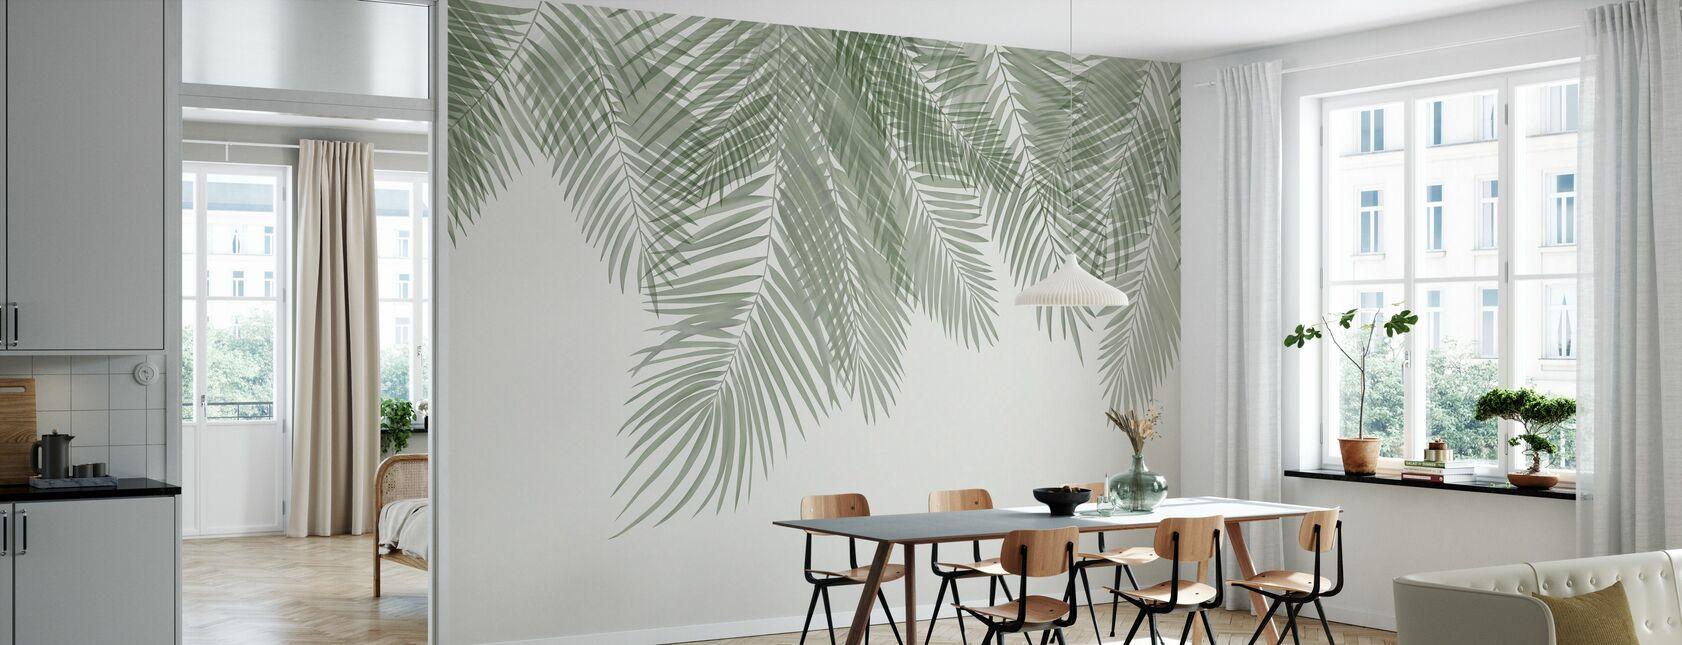 Hanging Palm Leaves - Beige-Green - Wallpaper - Kitchen